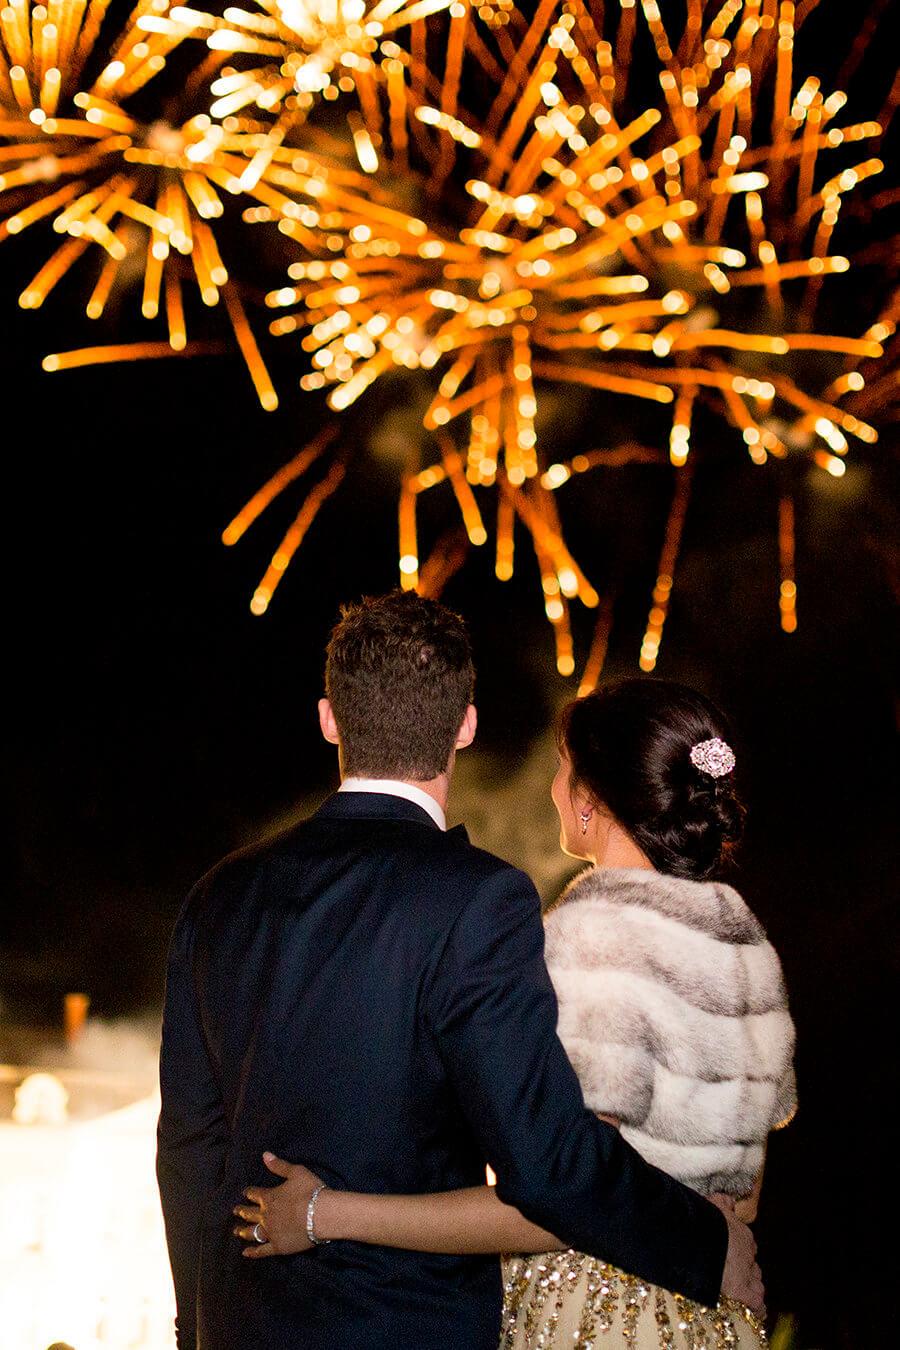 how-to-plan-a-destination-wedding-in-paris-france-desti-guide-to-destination-weddings-podcast-destipro-wedding-planner-fete-in-france-interview-6.jpg